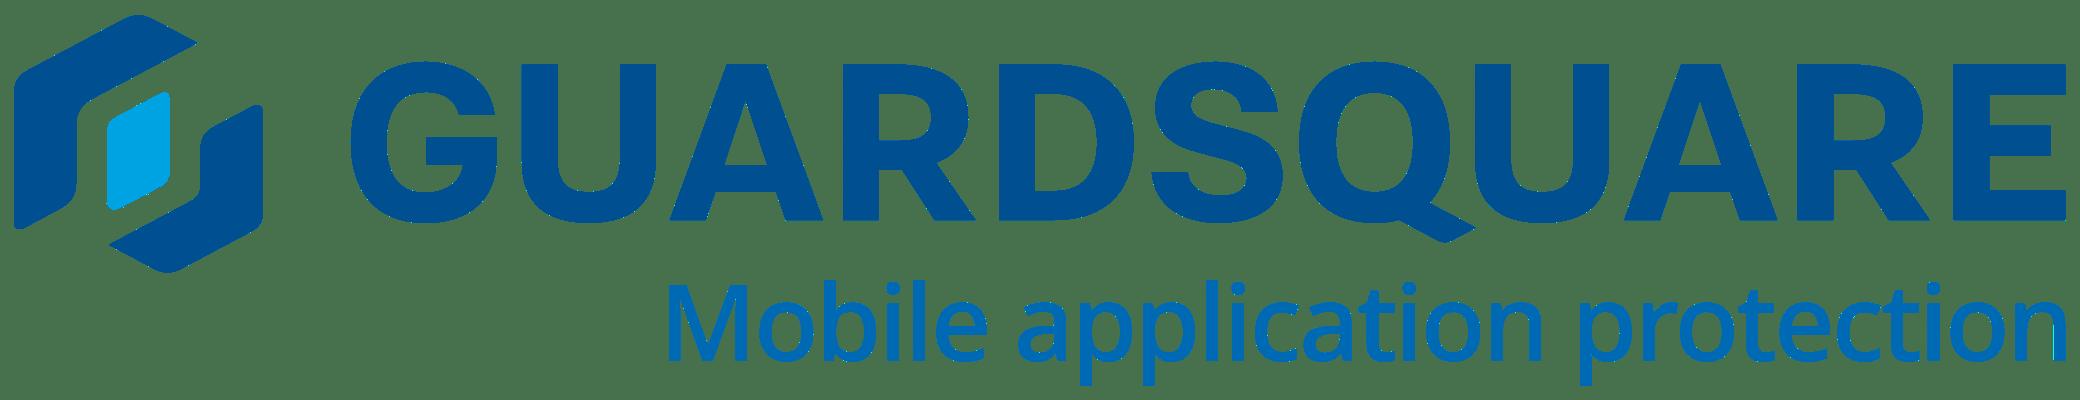 GuardSquare | Mobile Application Protection logo